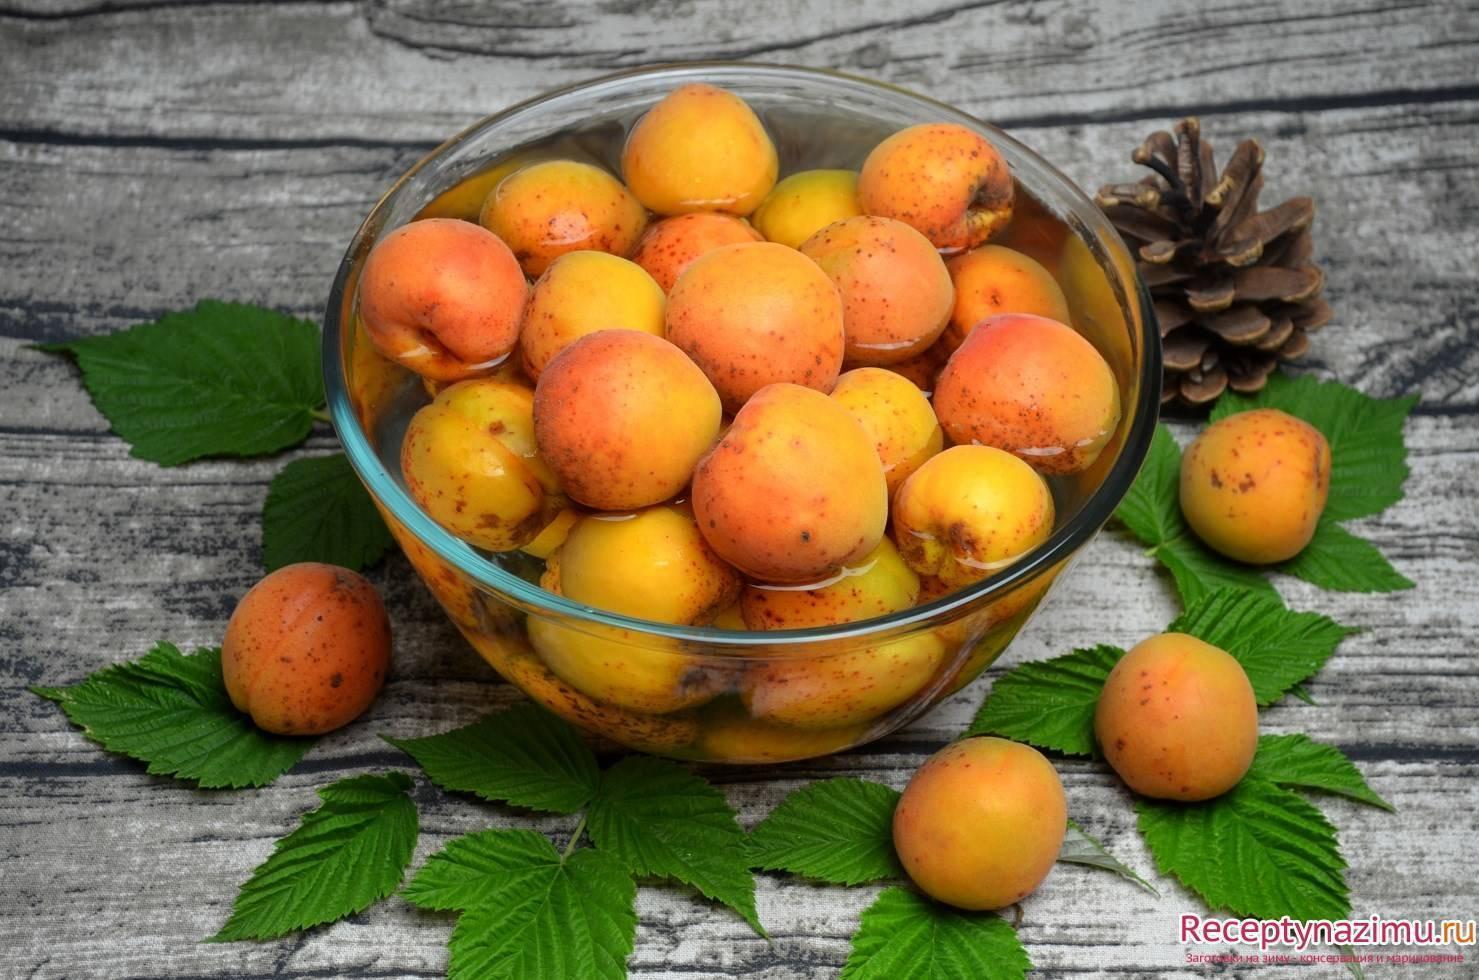 Самогон из абрикосов: рецепт в домашних условиях